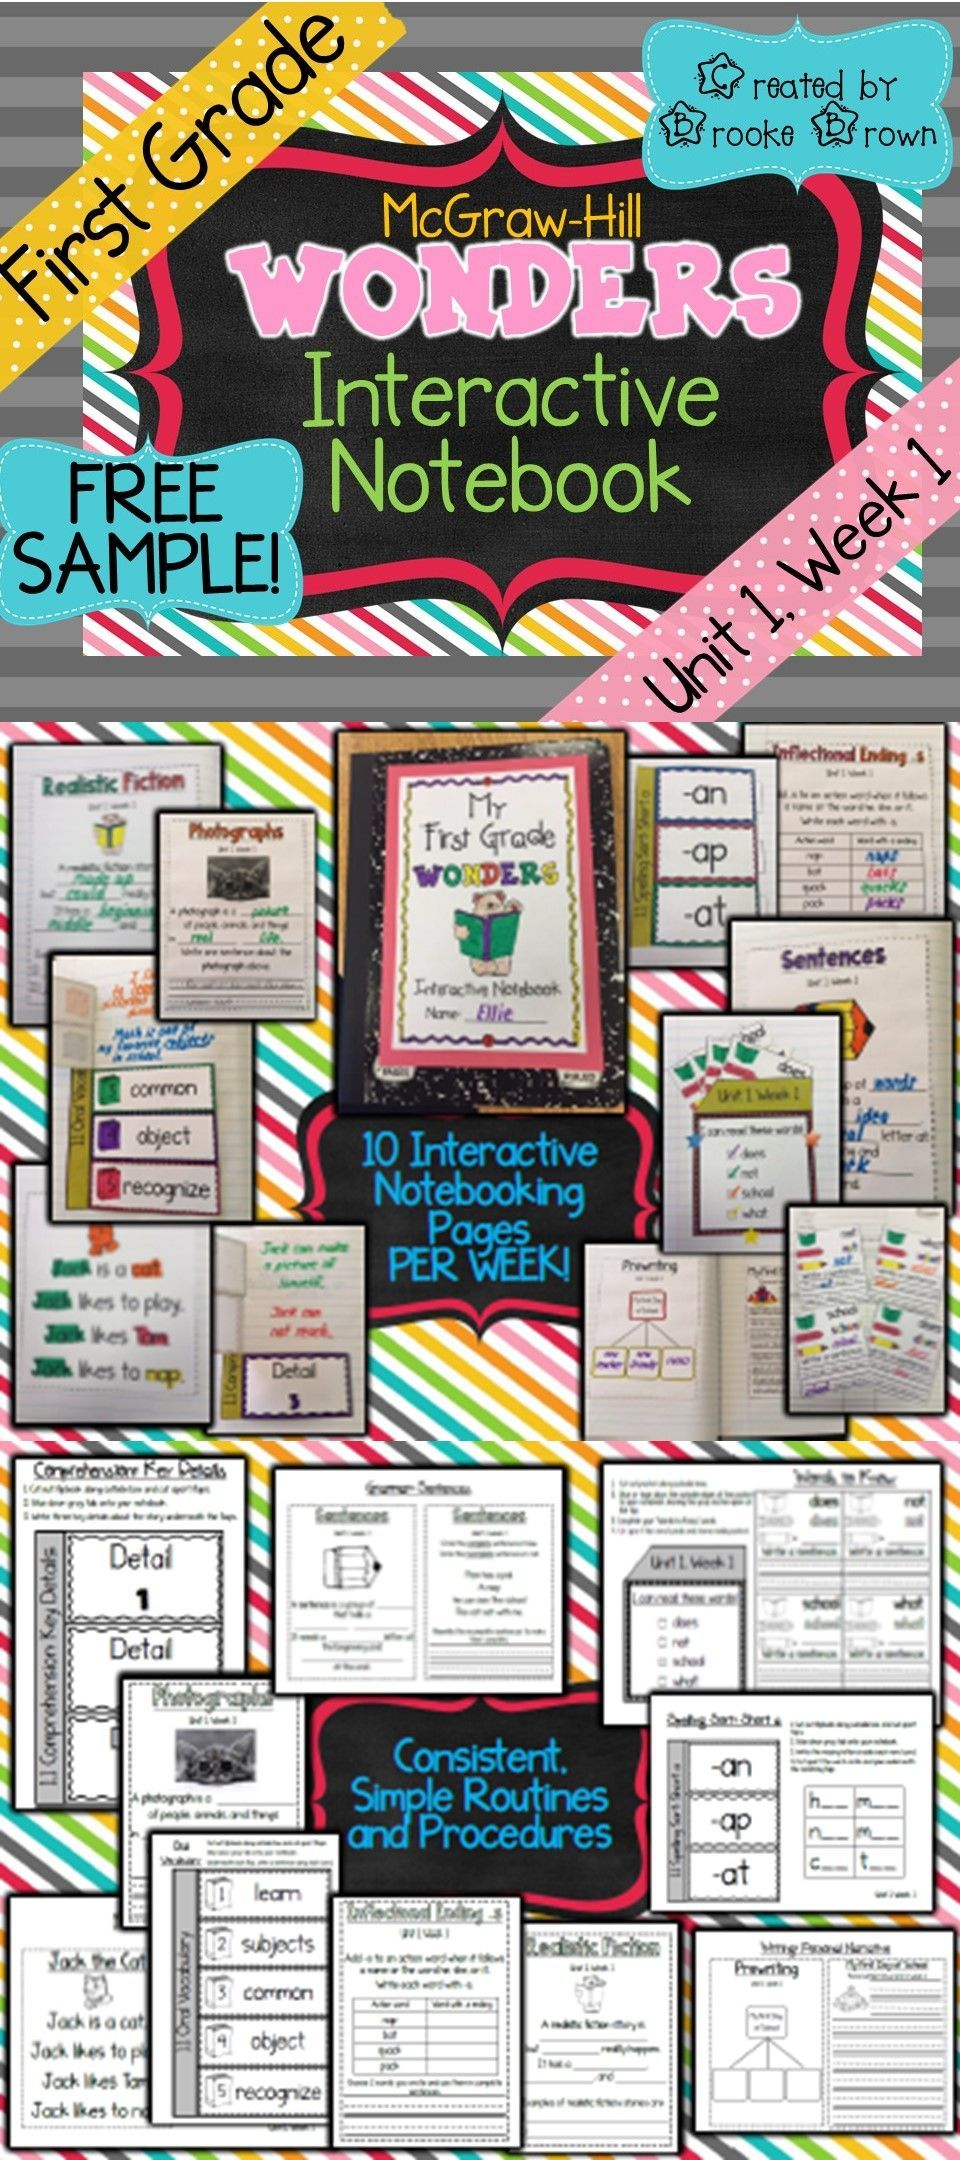 Free Sample Brand New First Grade Mcgraw Hill Wonders Interactive Notebooks 1st Gr First Grade Reading Interactive Notebooks Free Math Interactive Notebook First grade reading programs online